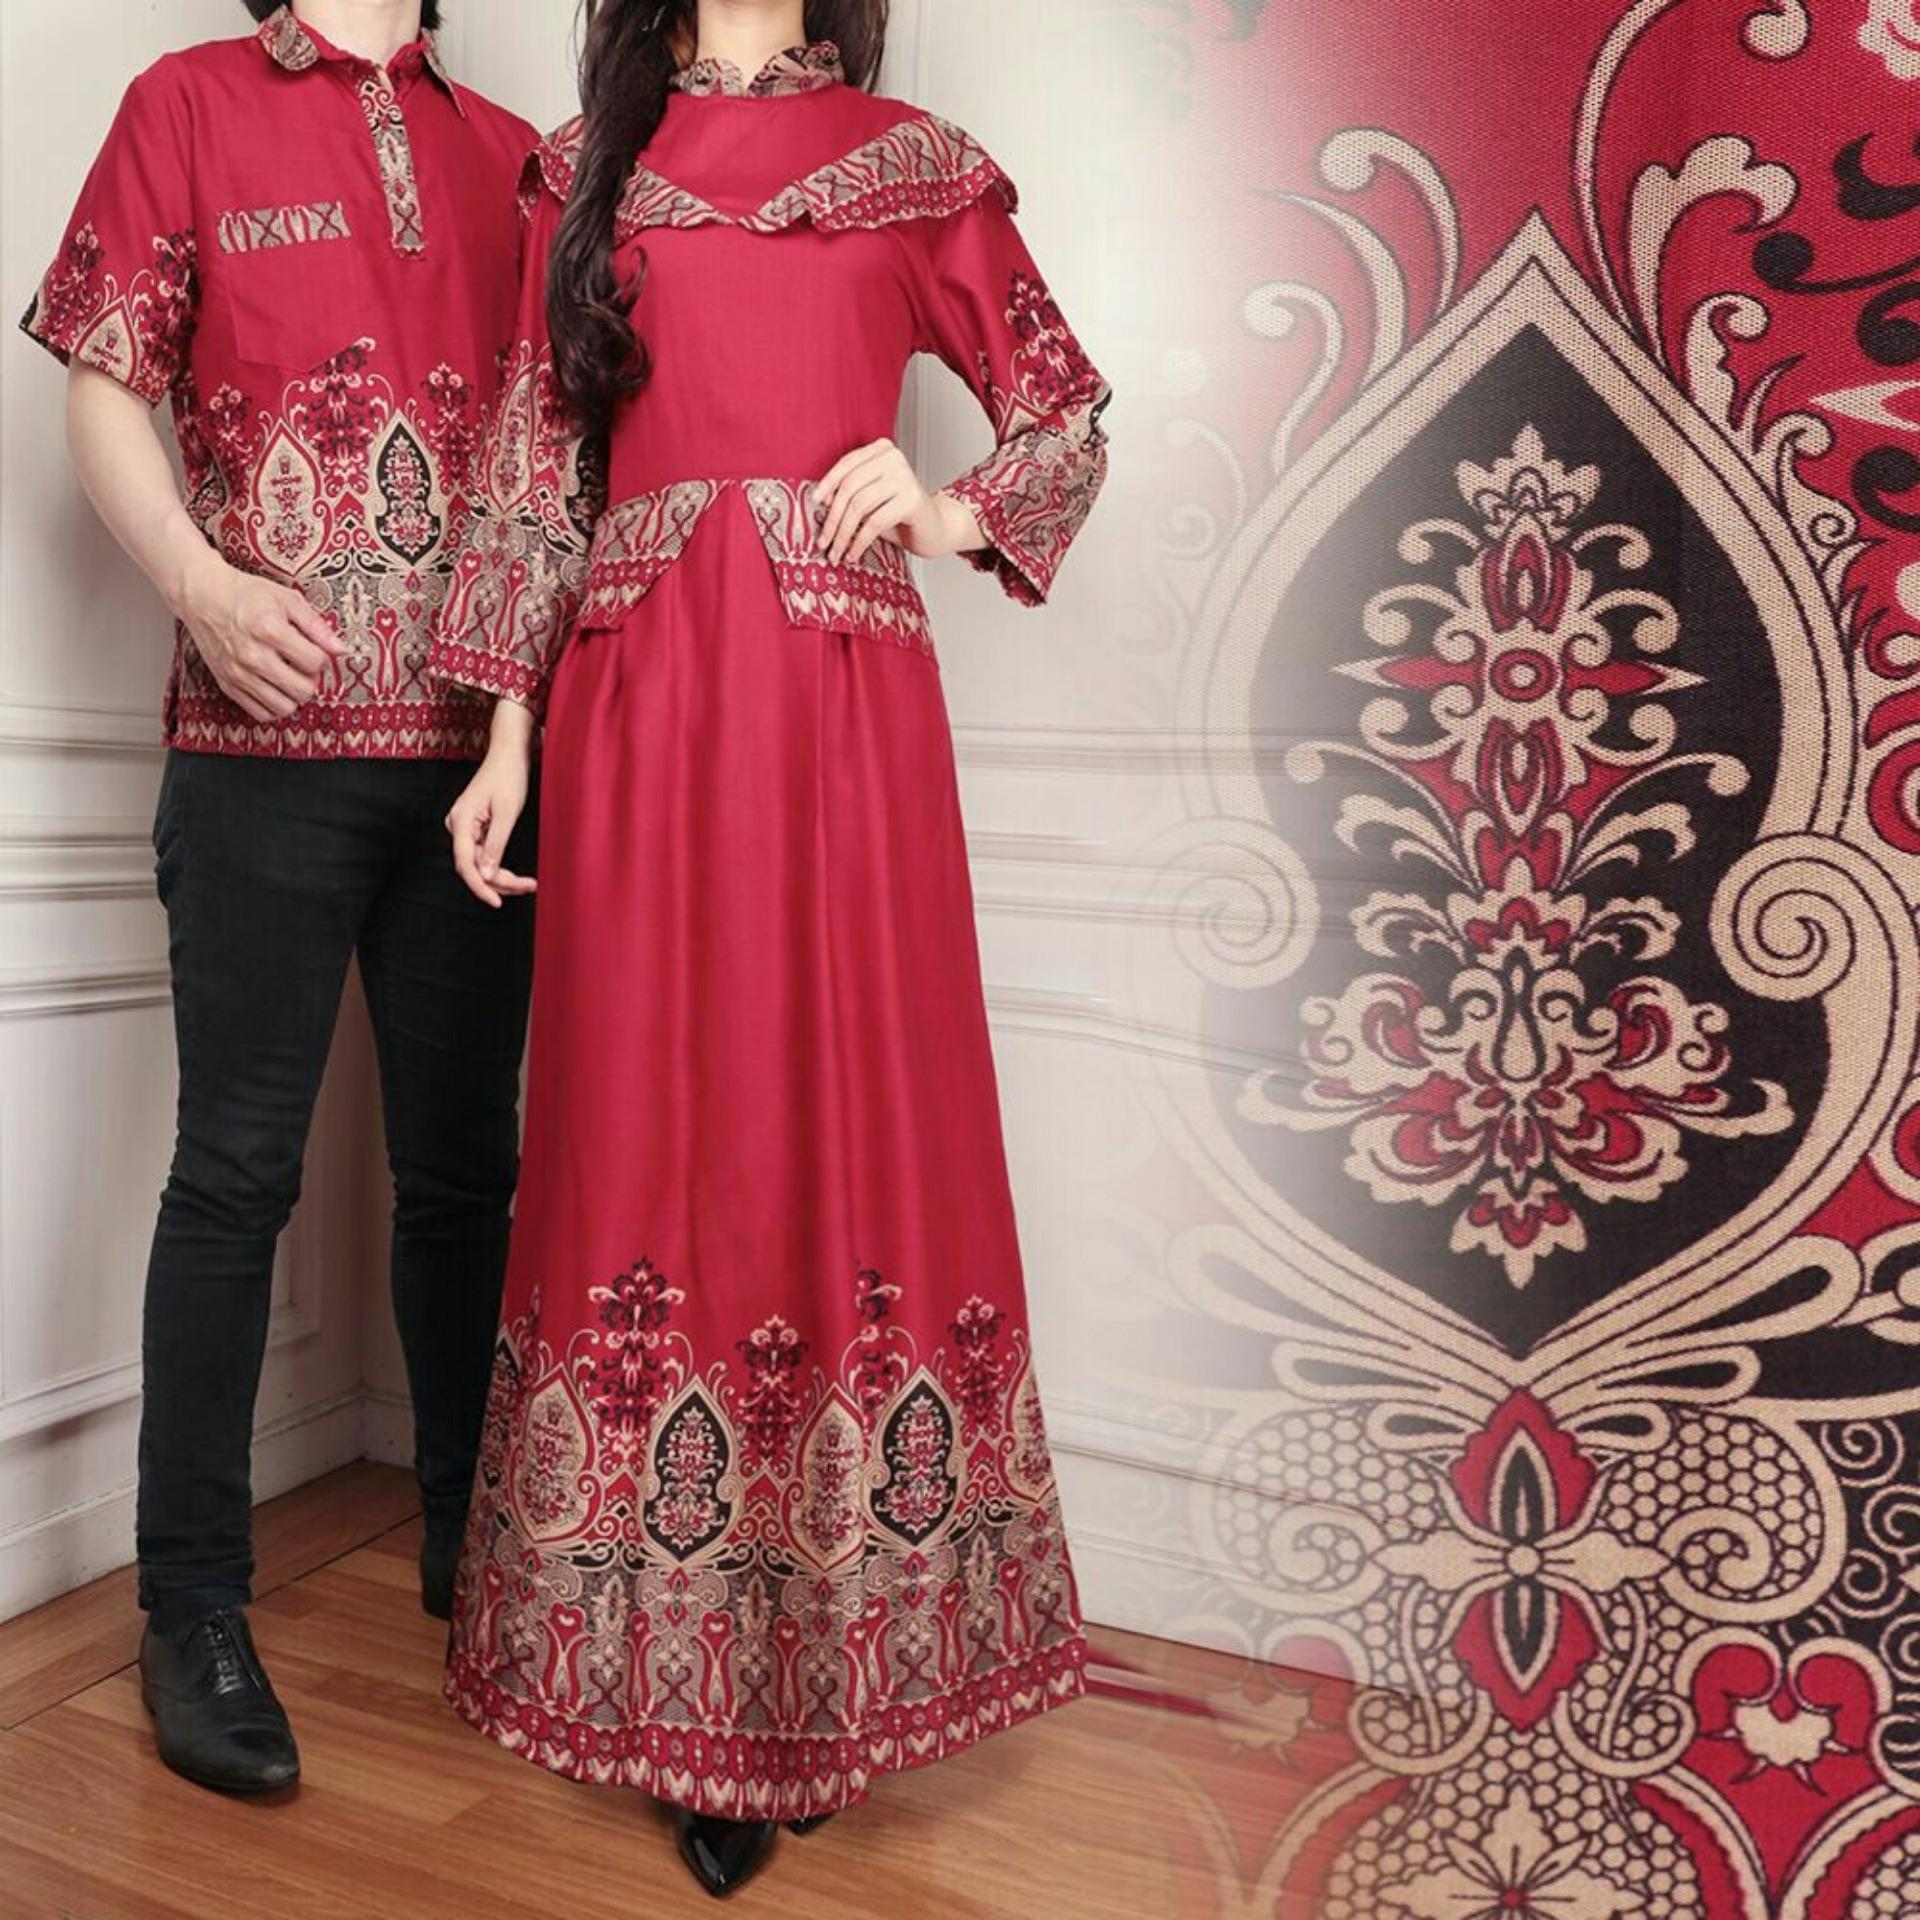 ... Busana / Kemeja Pria Gaun Muslimah Gamis Wanita / Tzcpcaca. Flavia Store Batik Couple FS0567 - MERAH MARUN / Sarimbit / Baju Muslim Pasangan / Sepasang